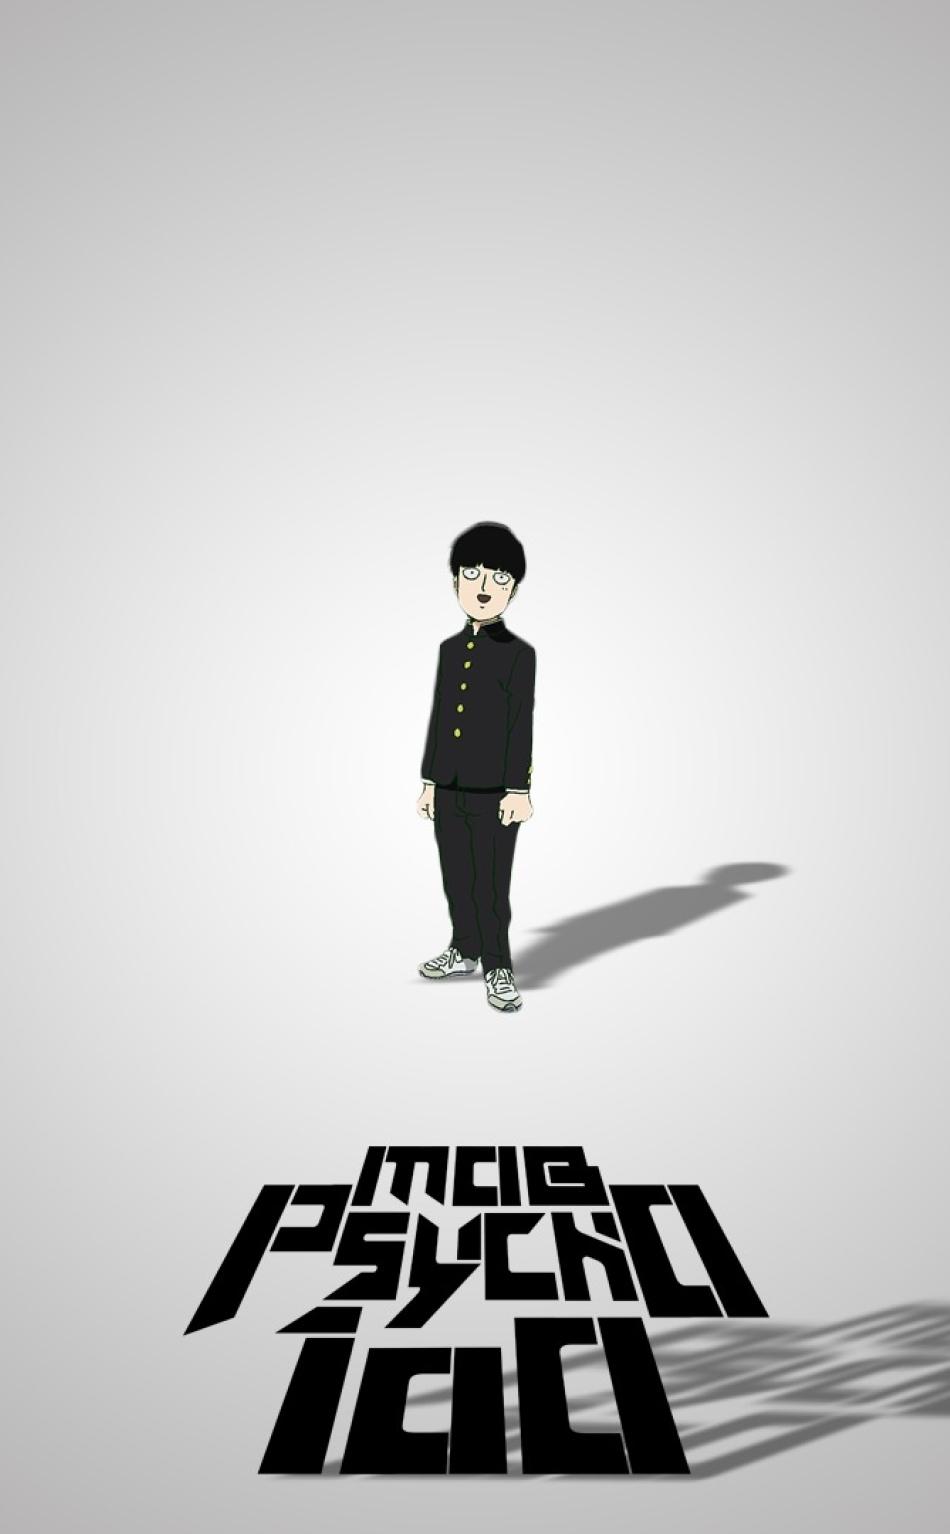 Mob Psycho 100 Kageyama Shigeo Full Hd Wallpaper